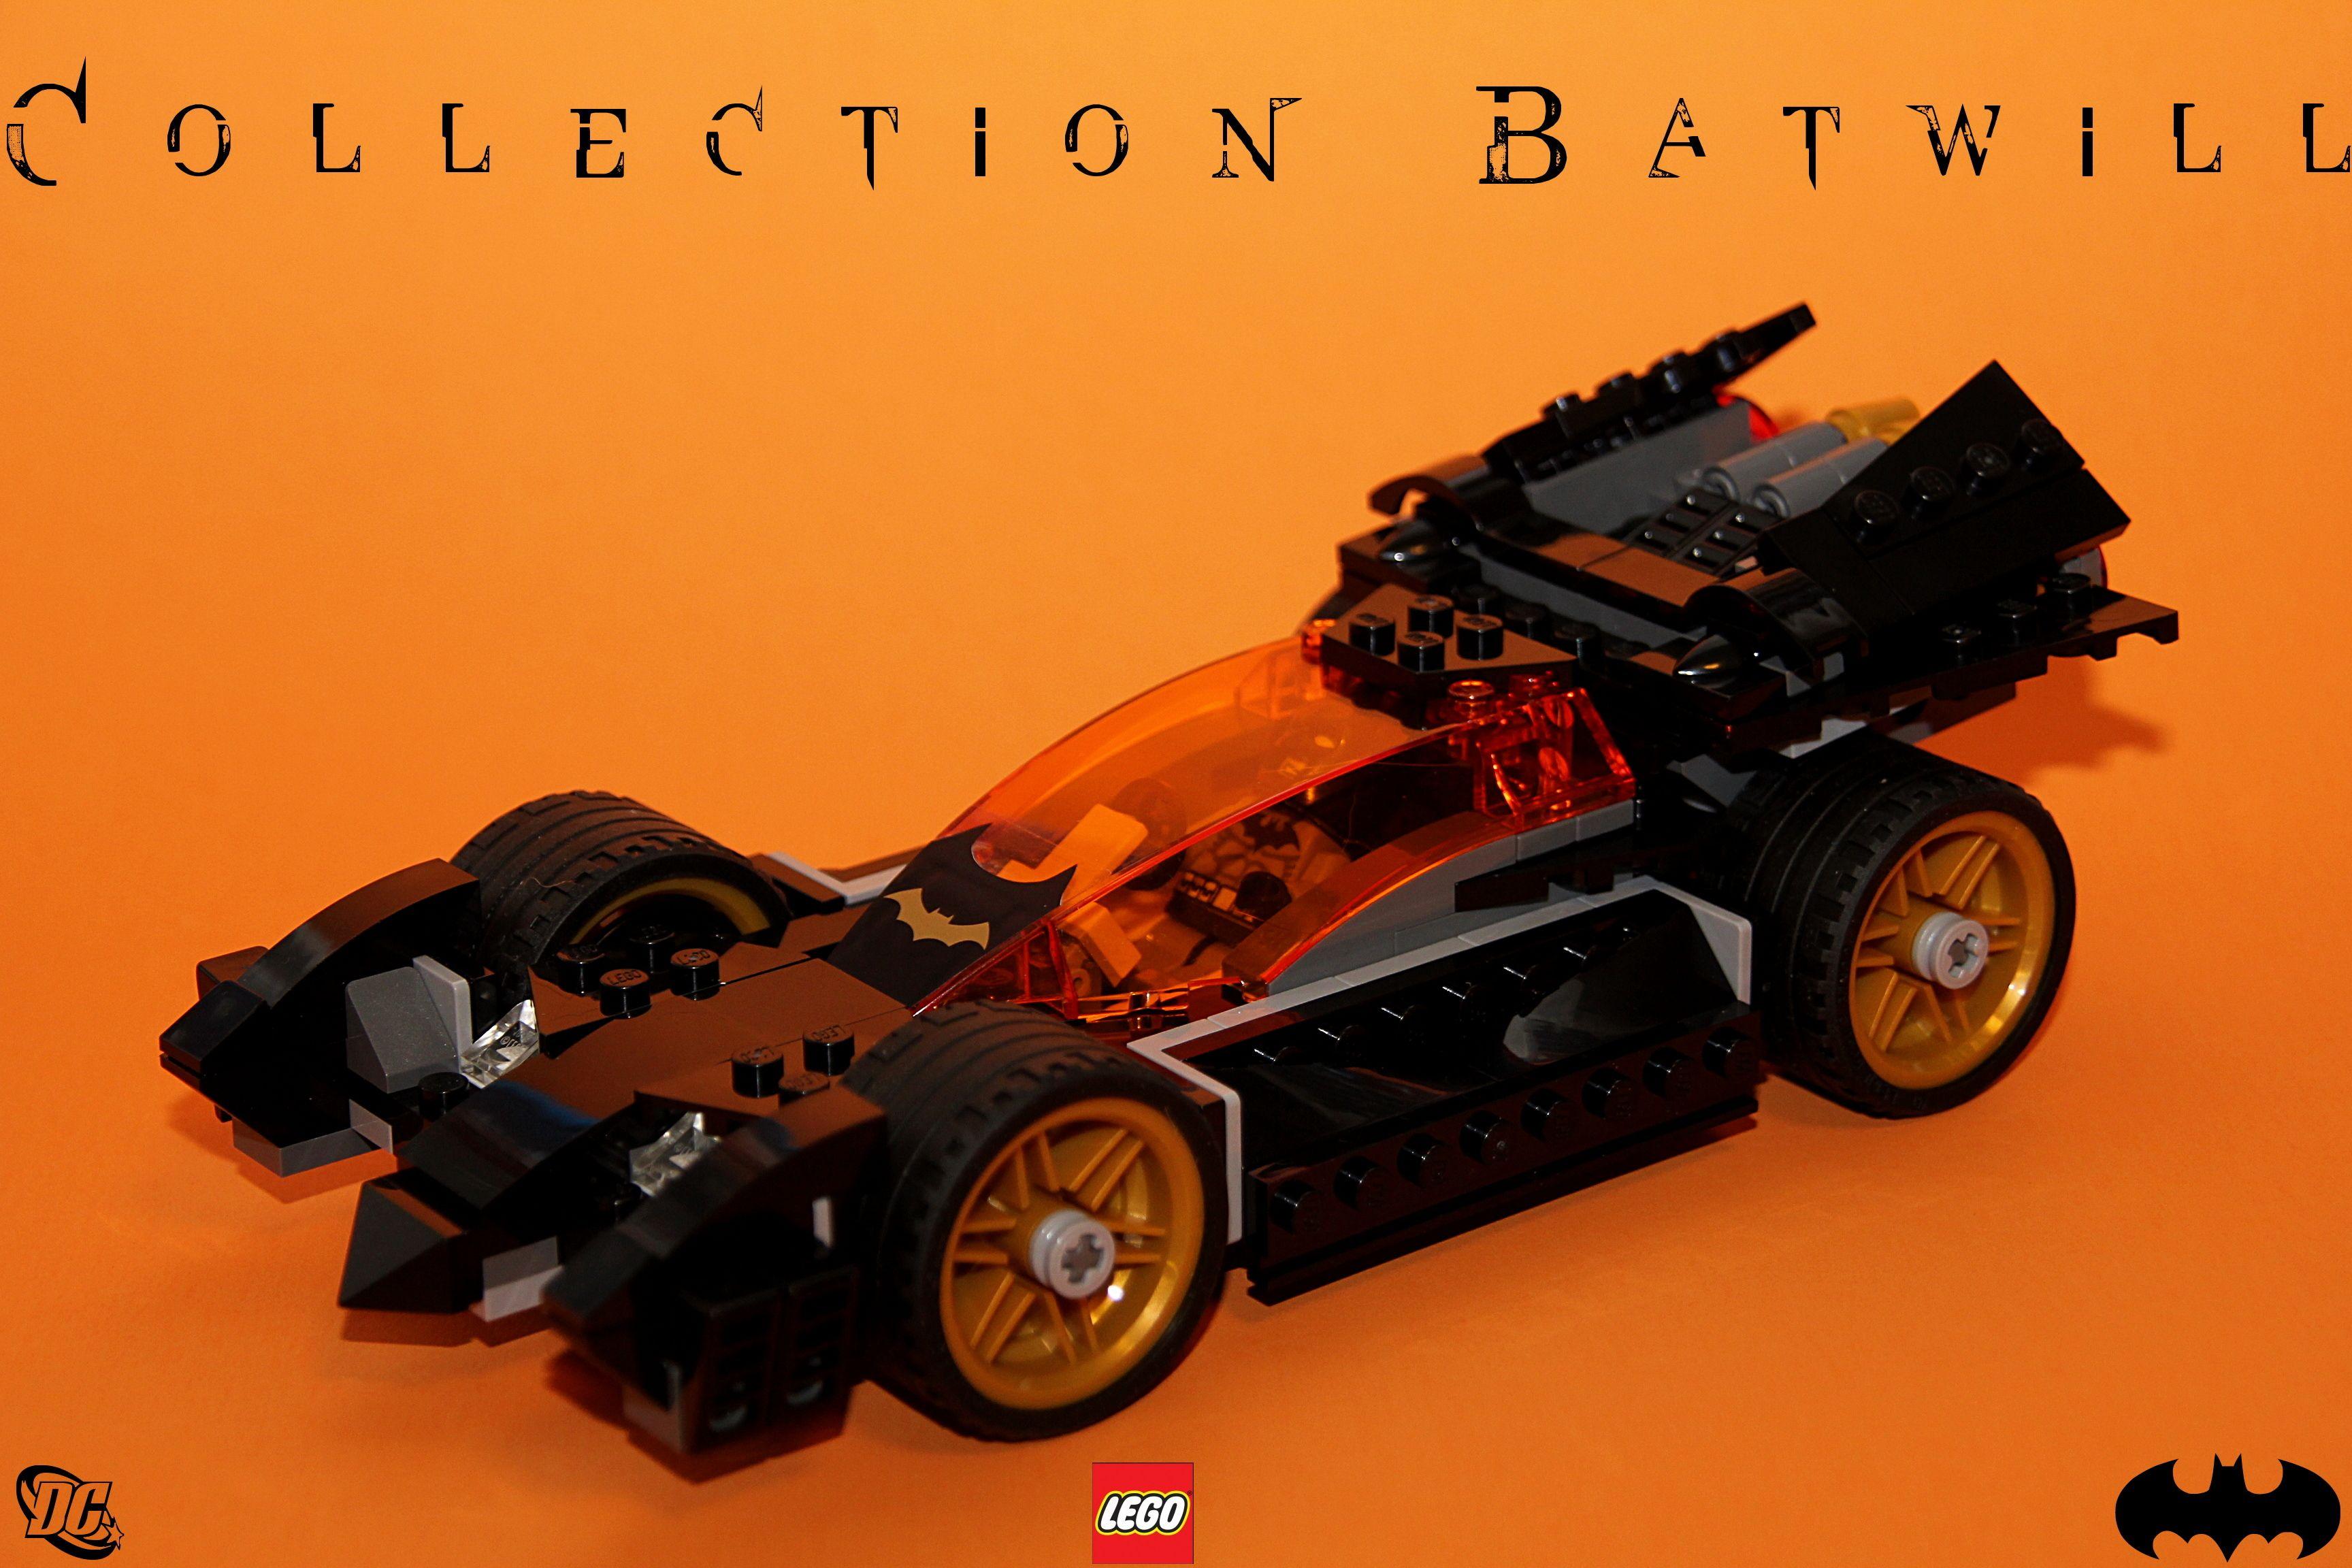 batmobile racer lego batman lego pinterest lego. Black Bedroom Furniture Sets. Home Design Ideas